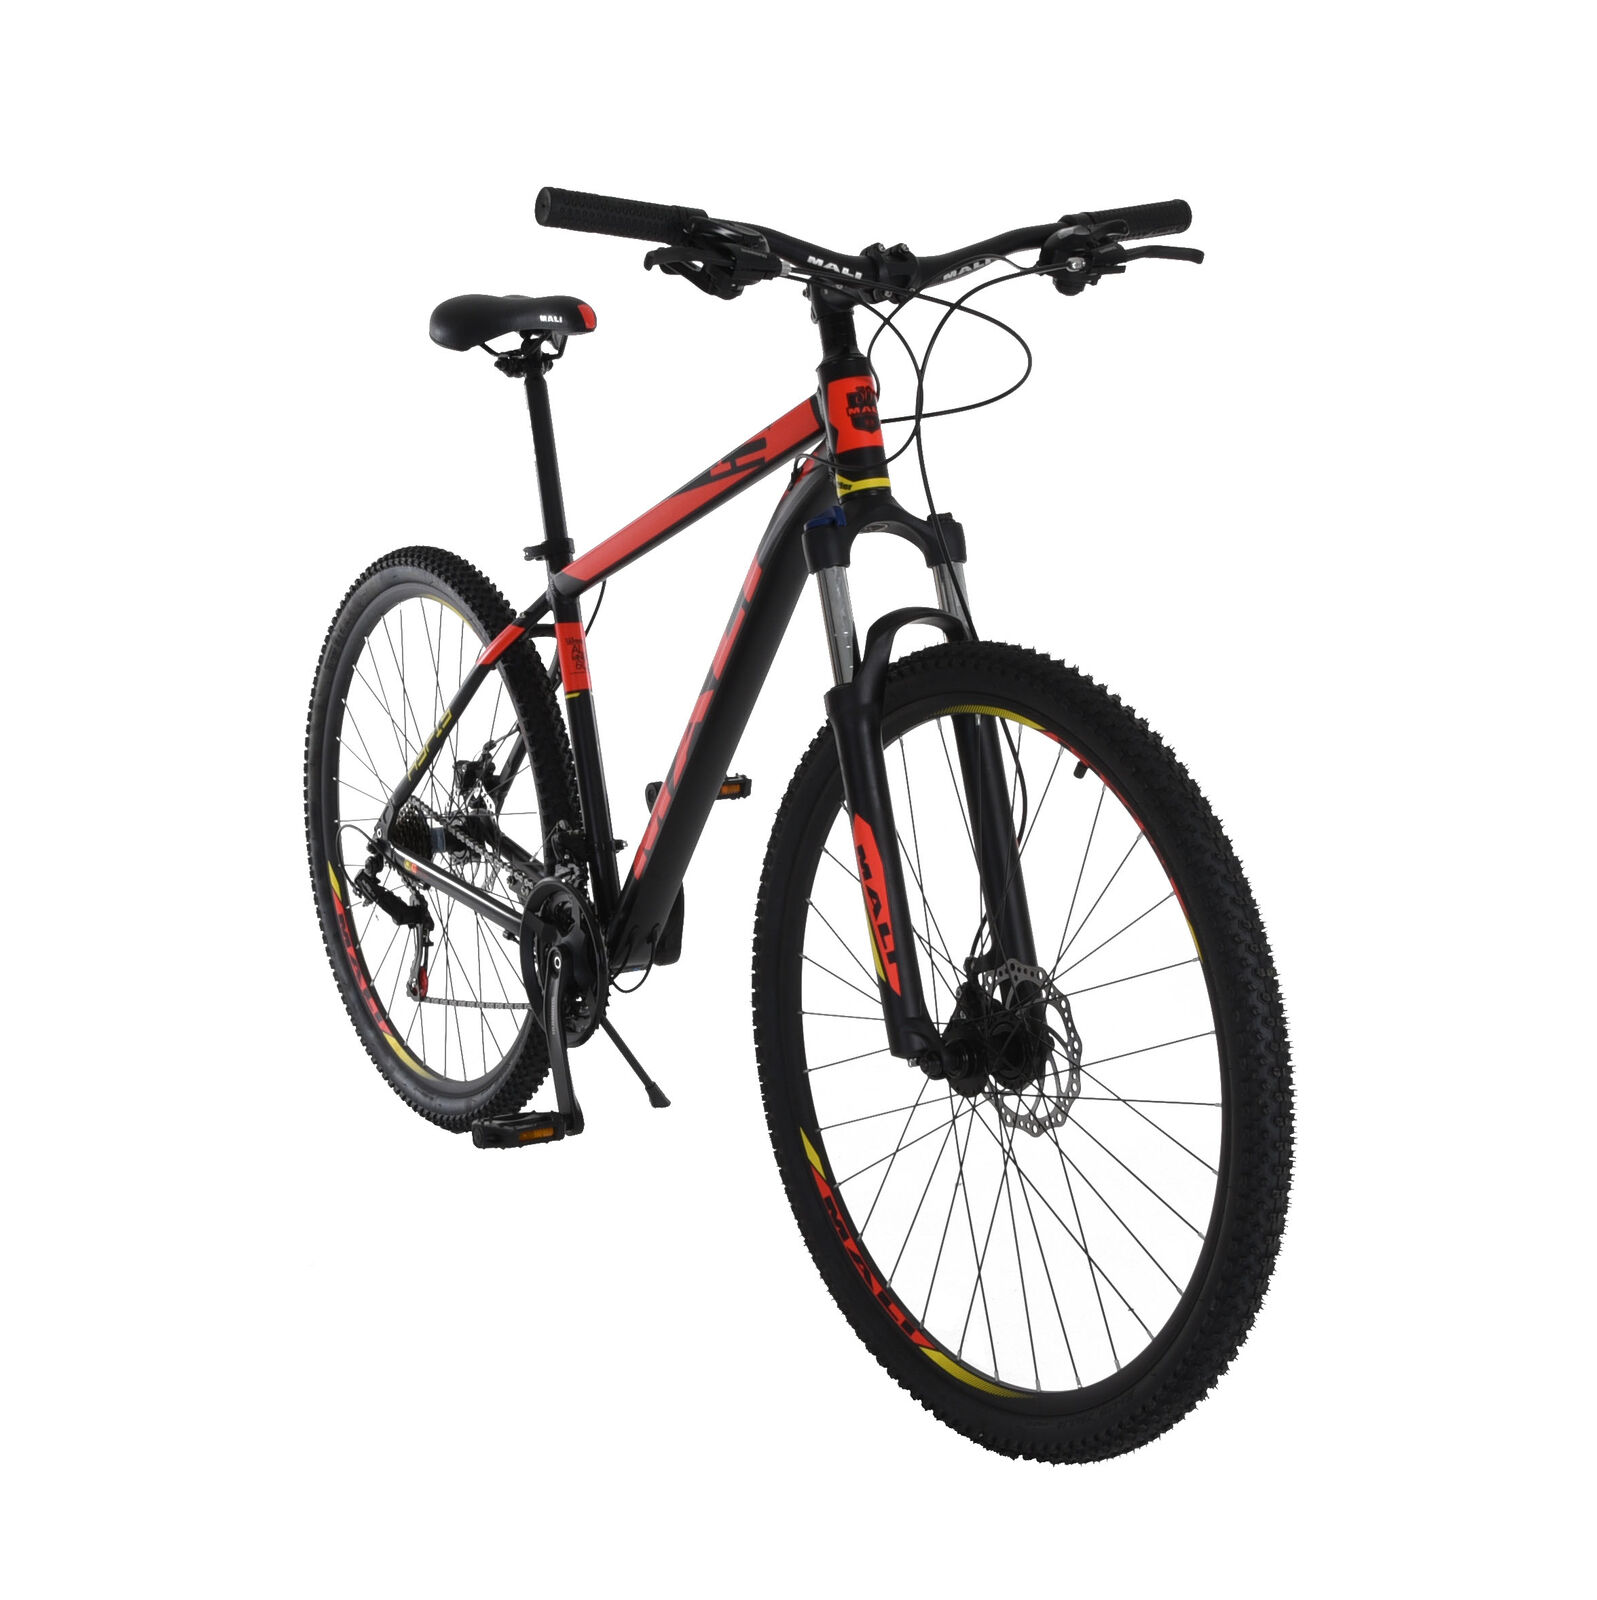 Diamondback Response Mountain Bike With 29 Inch Wheels Black For Sale Online Ebay